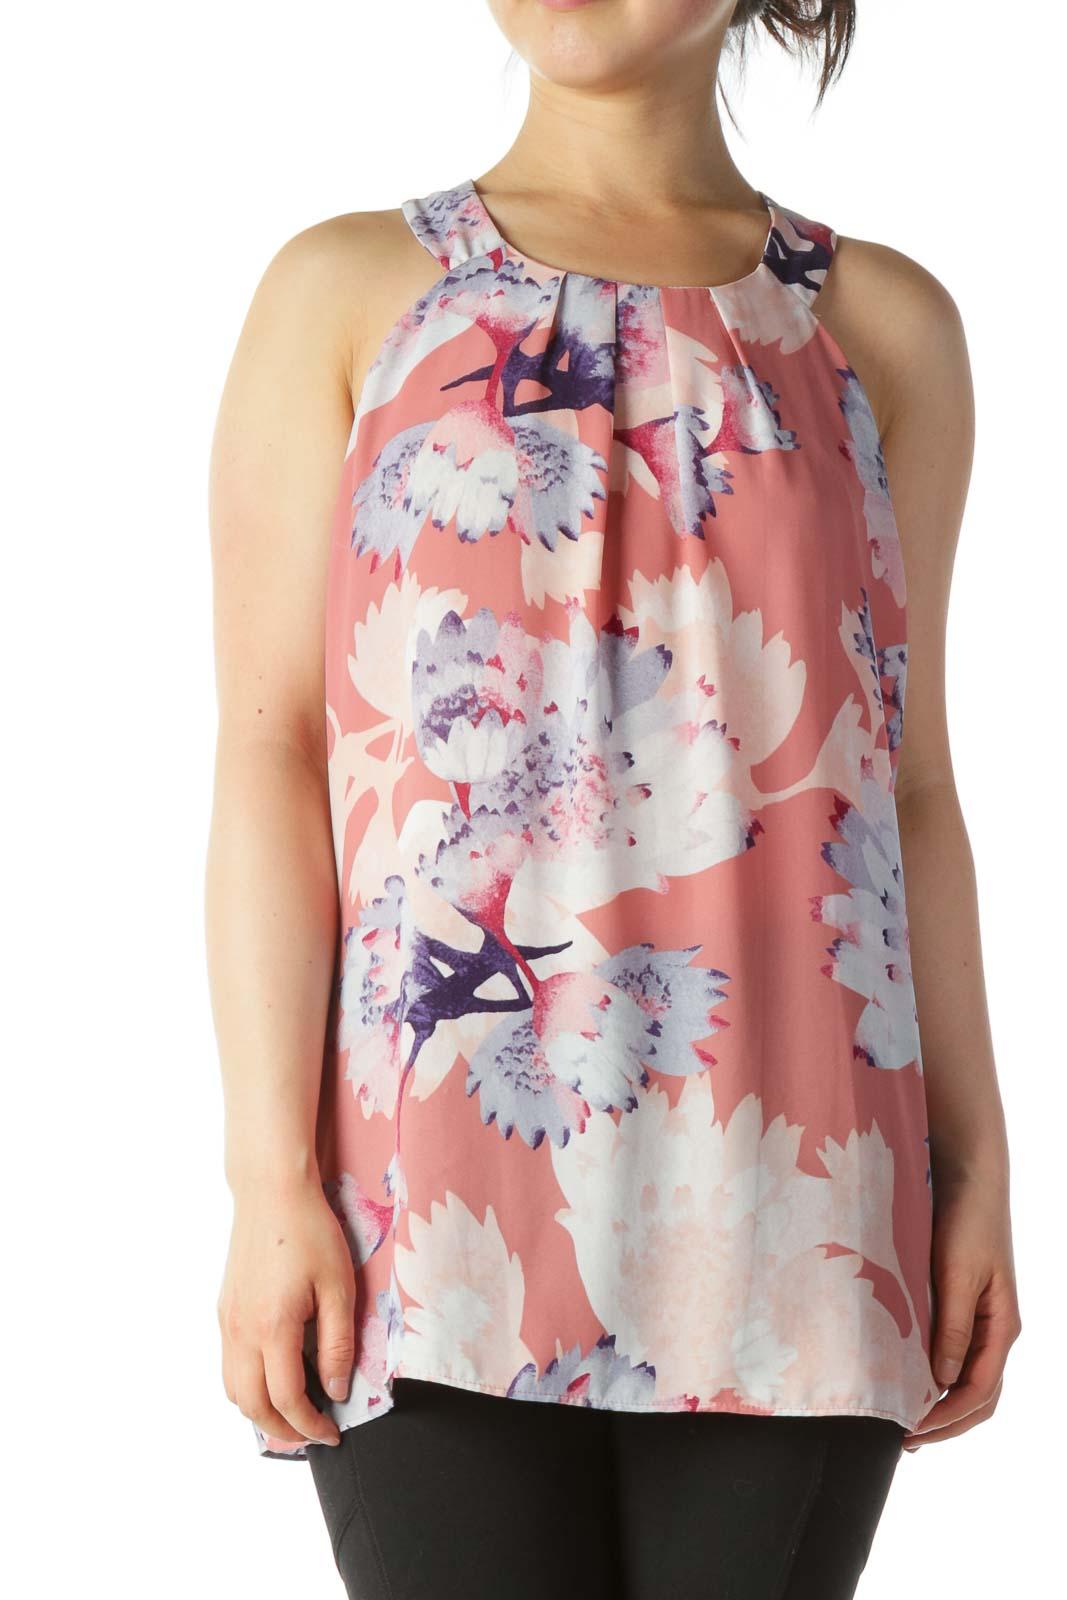 Multi-color Floral Print Pleated Neckline Blouse Front